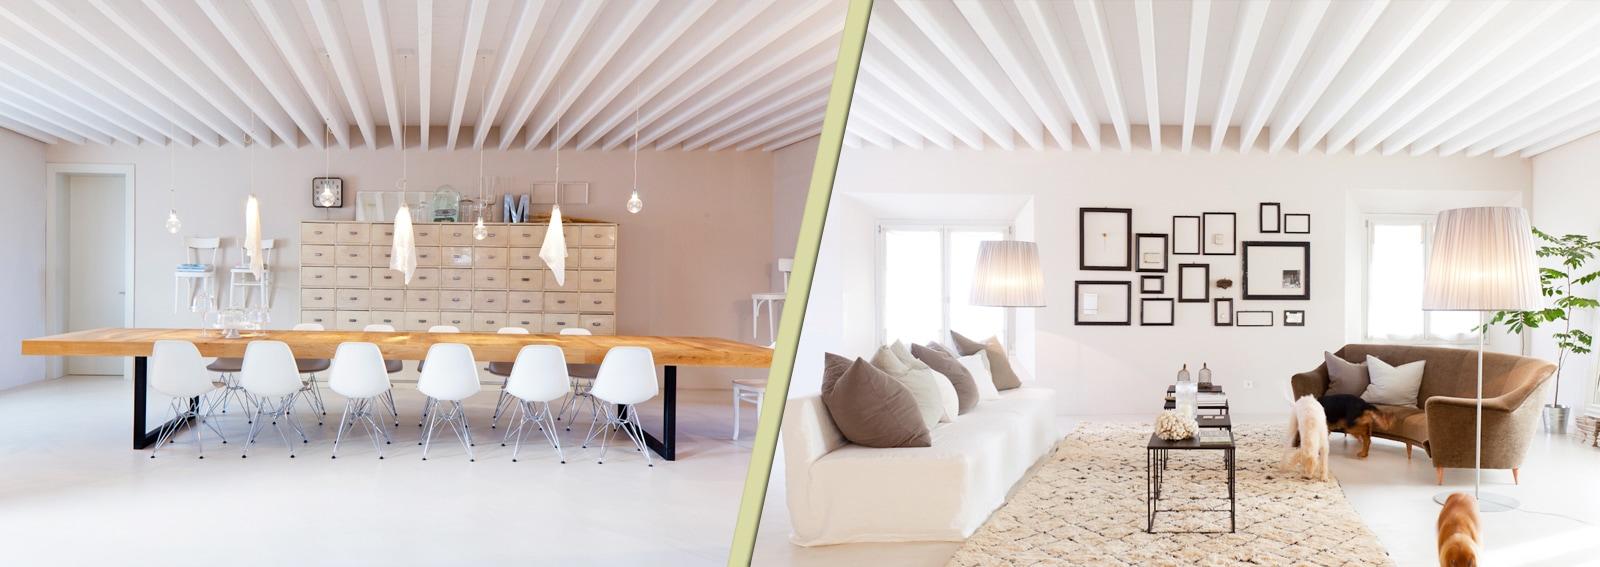 cover-malatesta-maison-de-charme-desktop